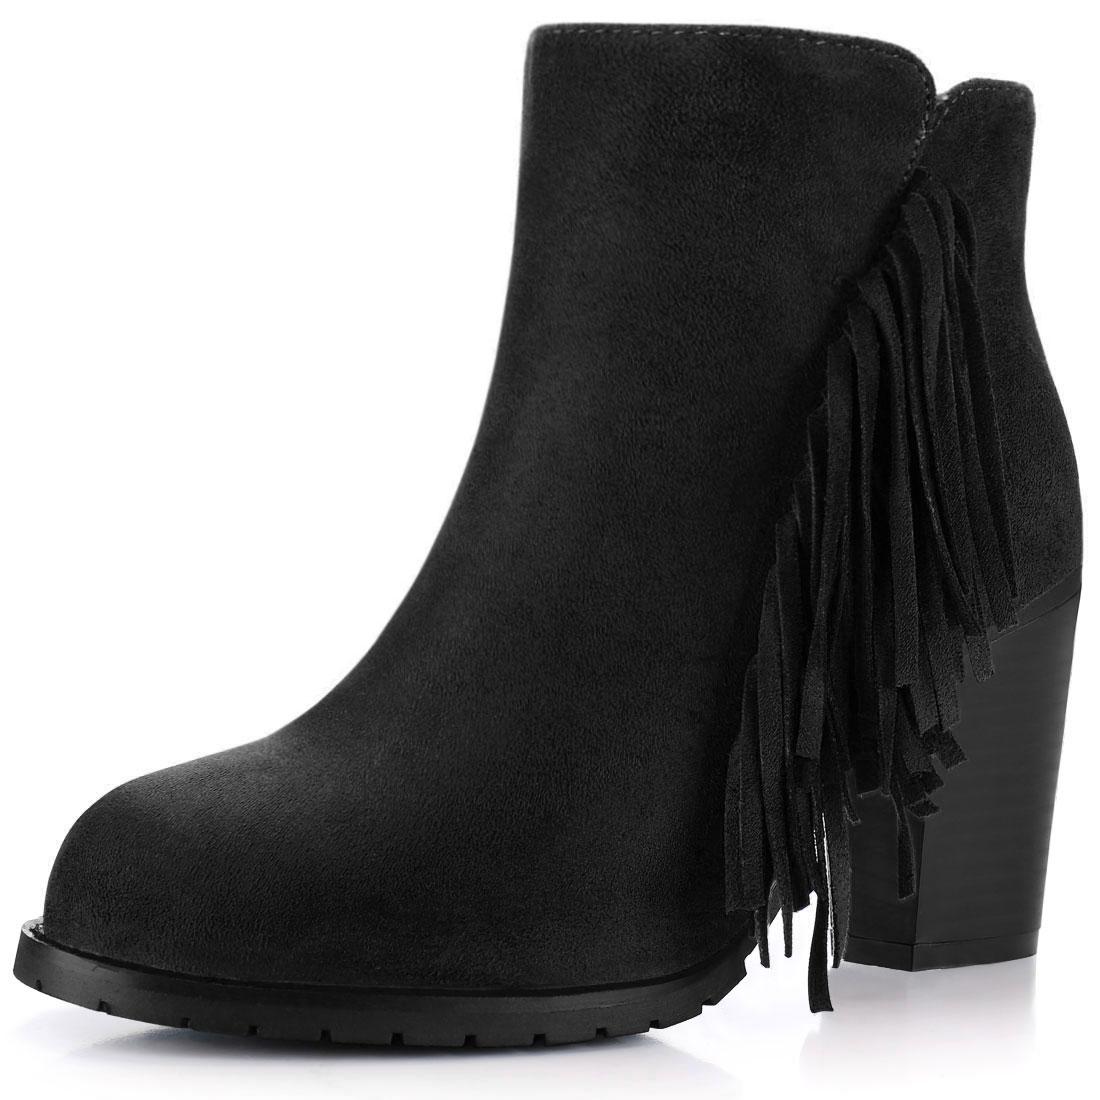 Women Fringe Trim Block High Heel Zip Side Ankle Boots Black US 7.5